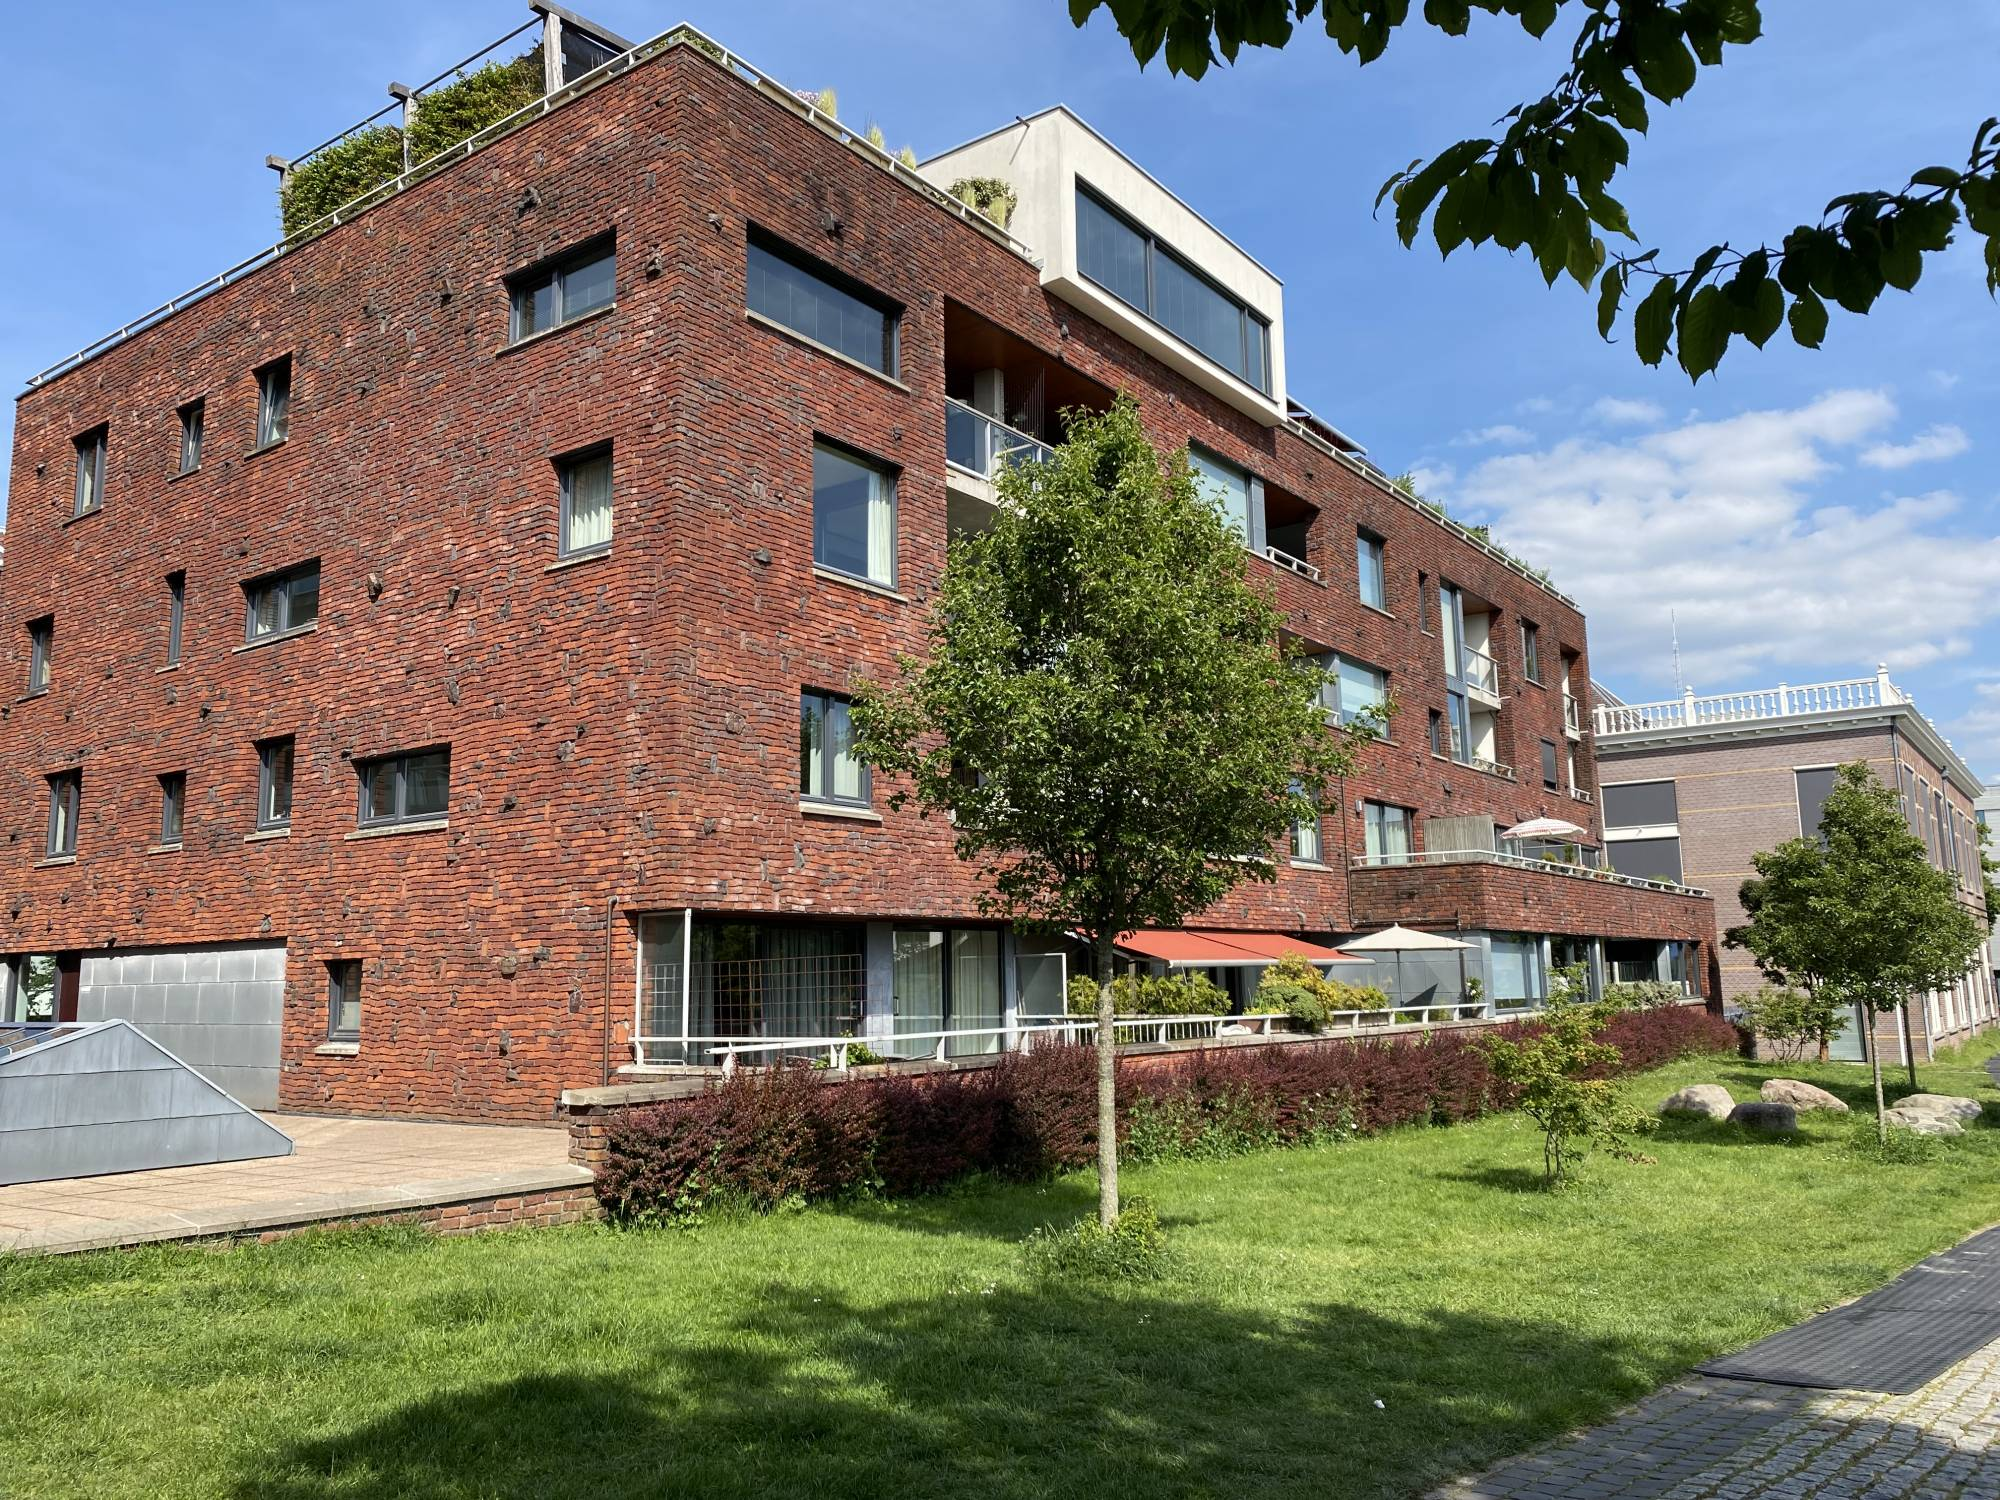 Reyer Anslostraat 66